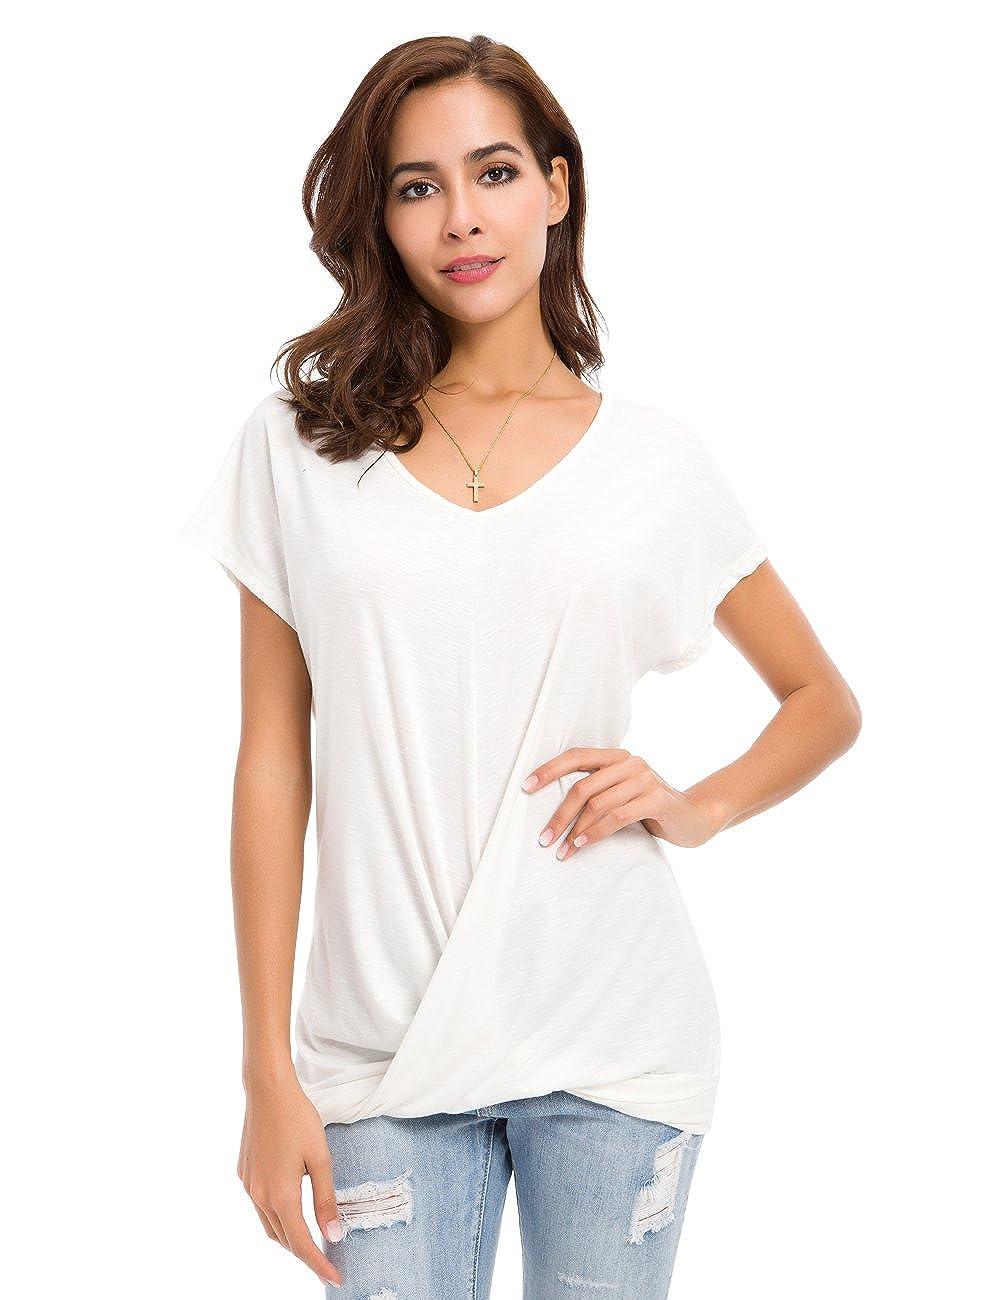 b0506860 Amazon.com: Womens Short Sleeve Twist Knot Loose Fitting Tops V Neck T  Shirts: Clothing